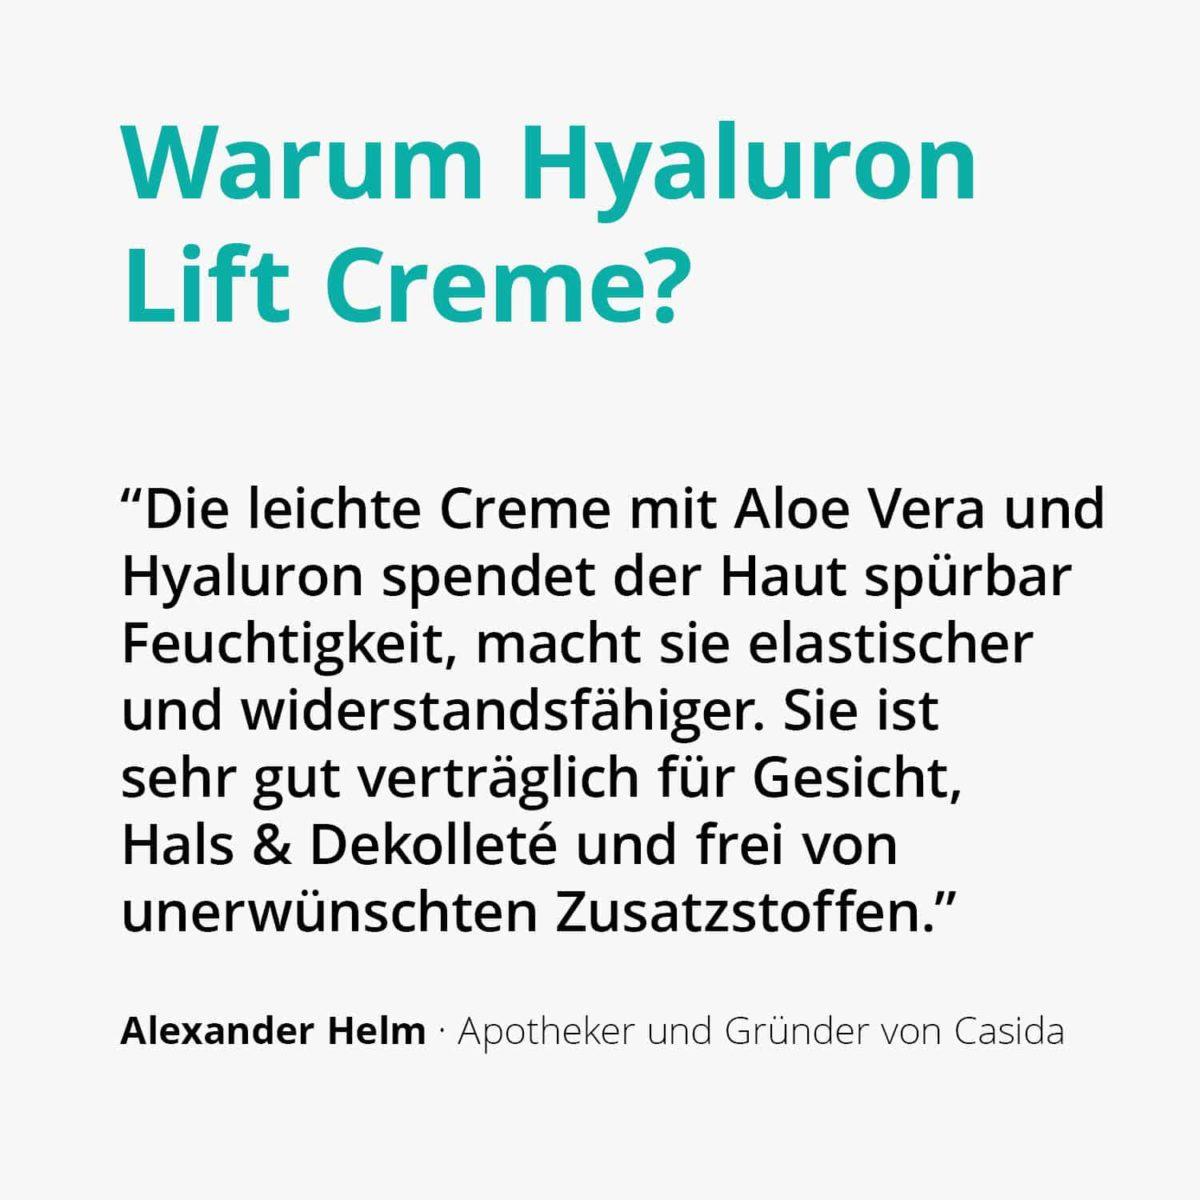 Casida Hyaluronic Acid Lift Cream with Aloe Vera 50 ml 16813082 PZN Apotheke Sommercreme Hyaluronsäure nicht-komedogen2